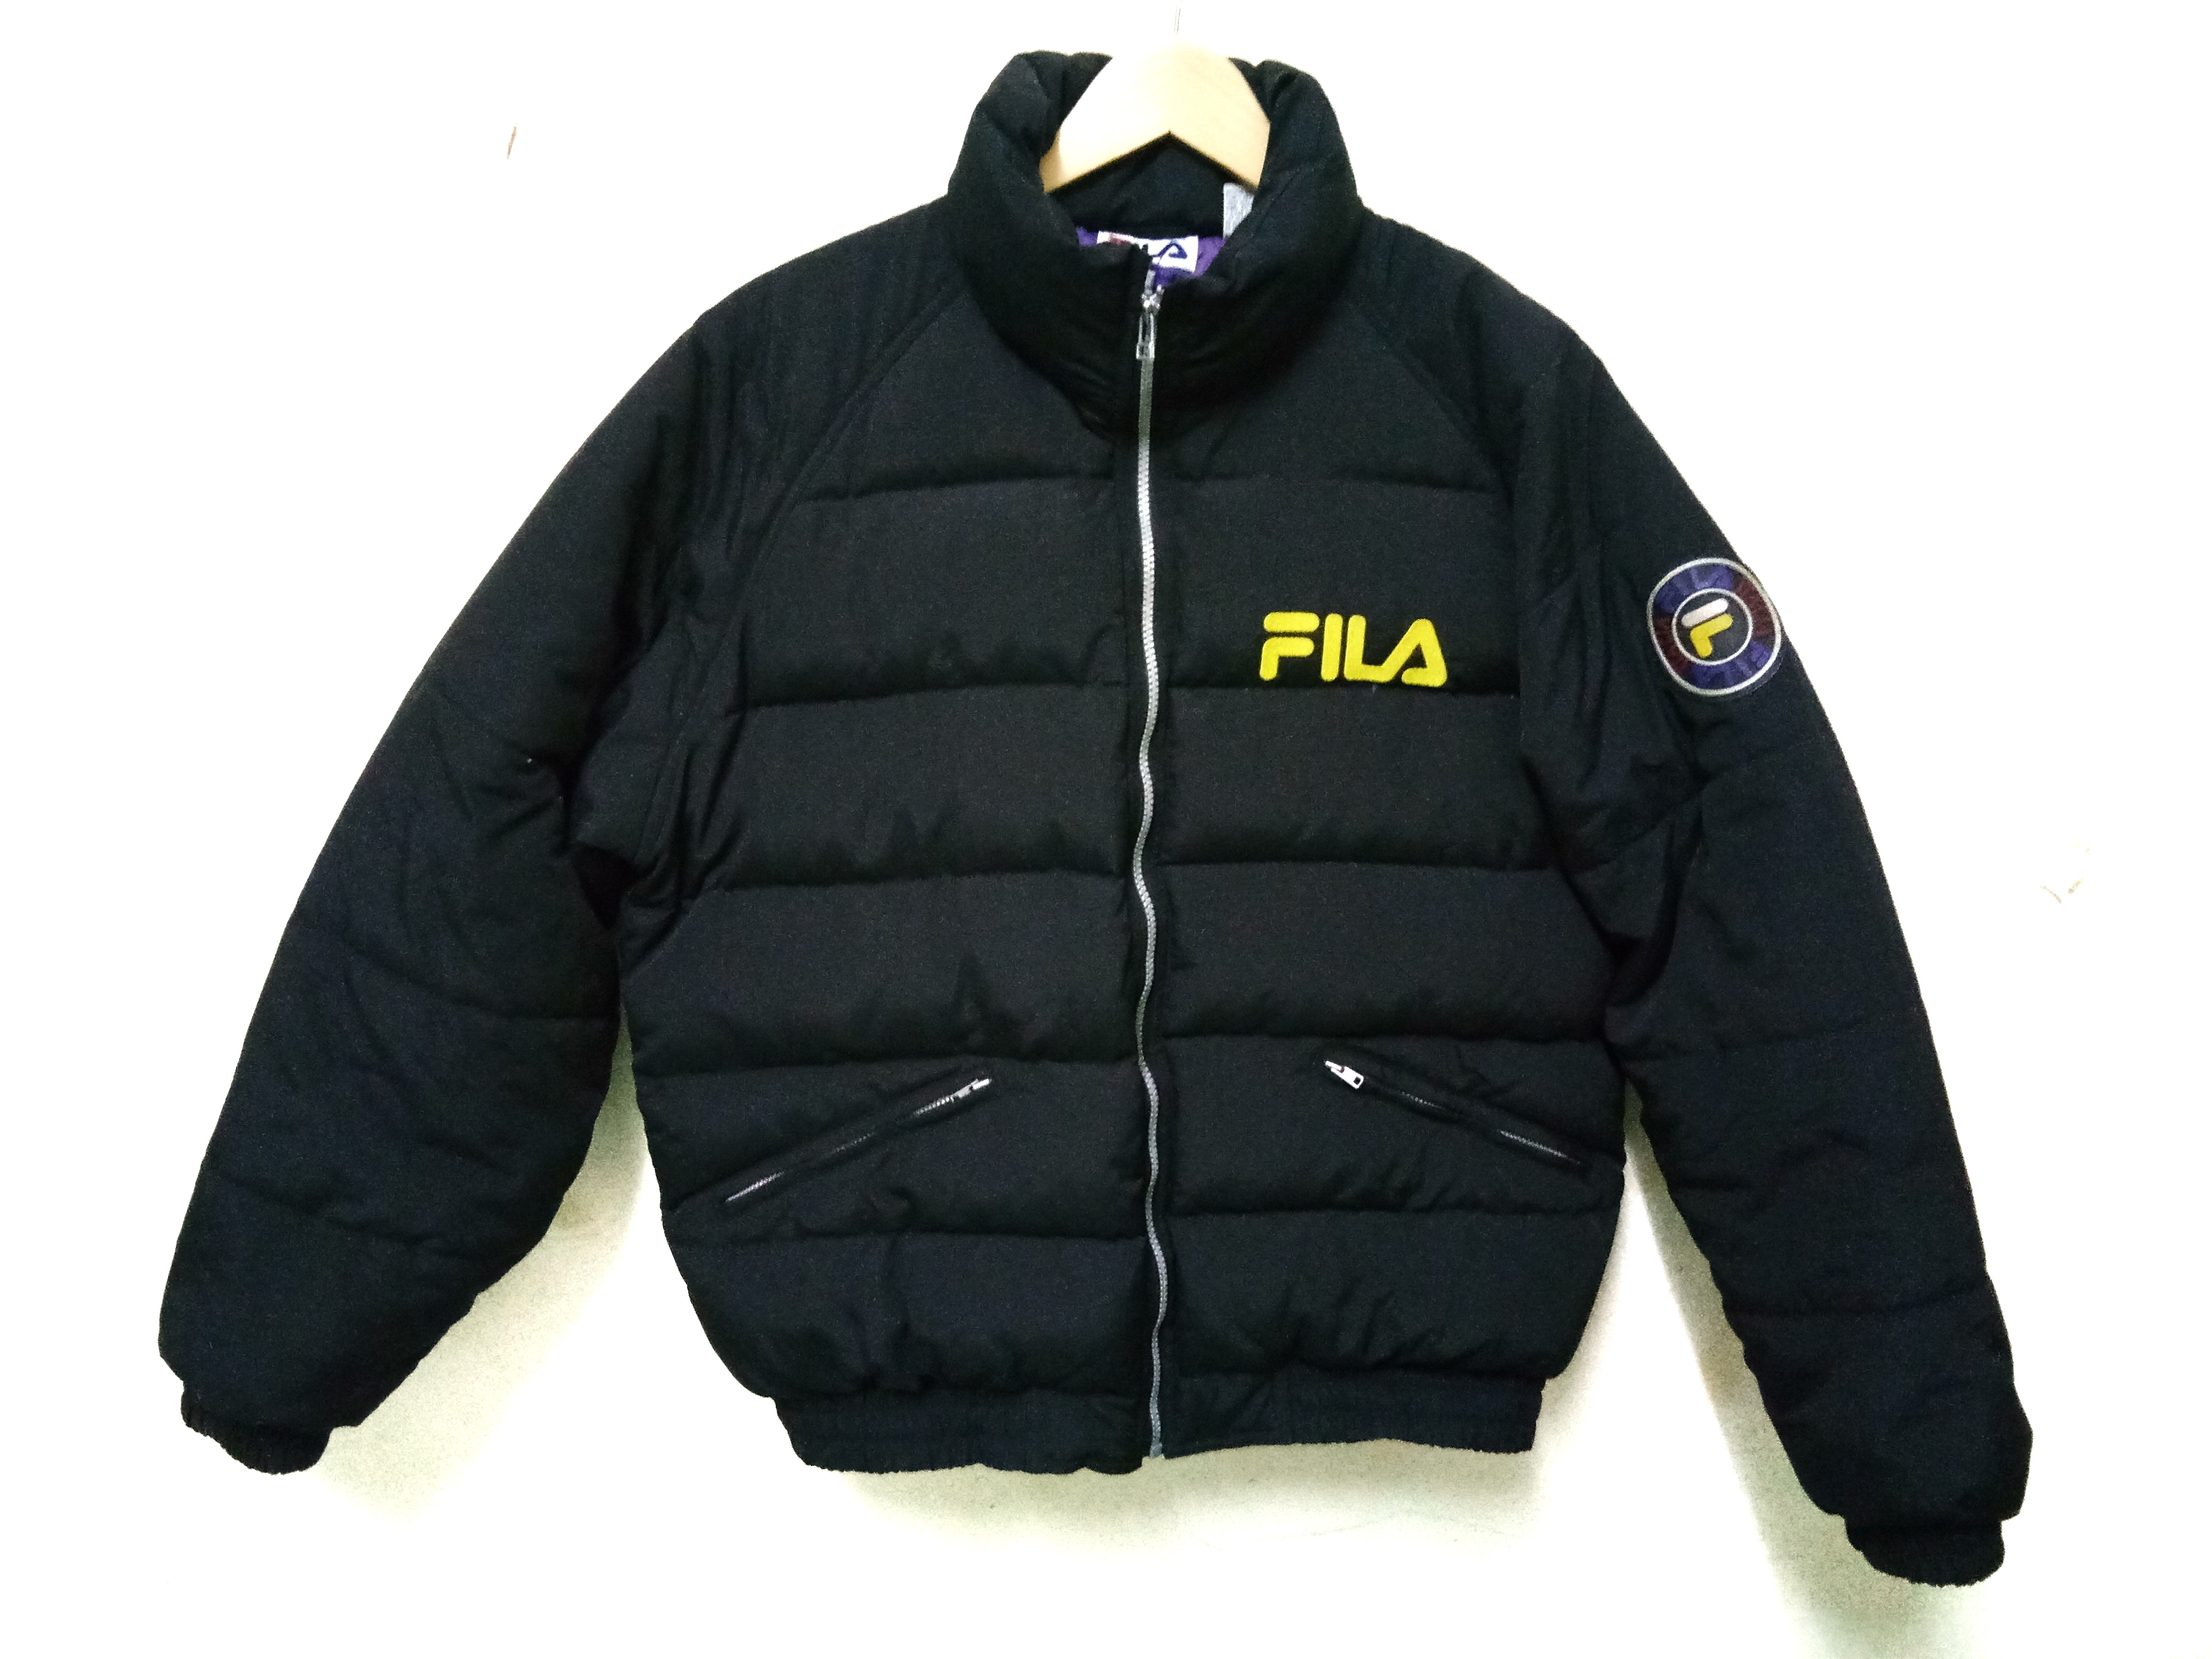 1ac7a08073a6 Fila Last Drop!! Goose Puffer Jacket Size m - Light Jackets for Sale -  Grailed